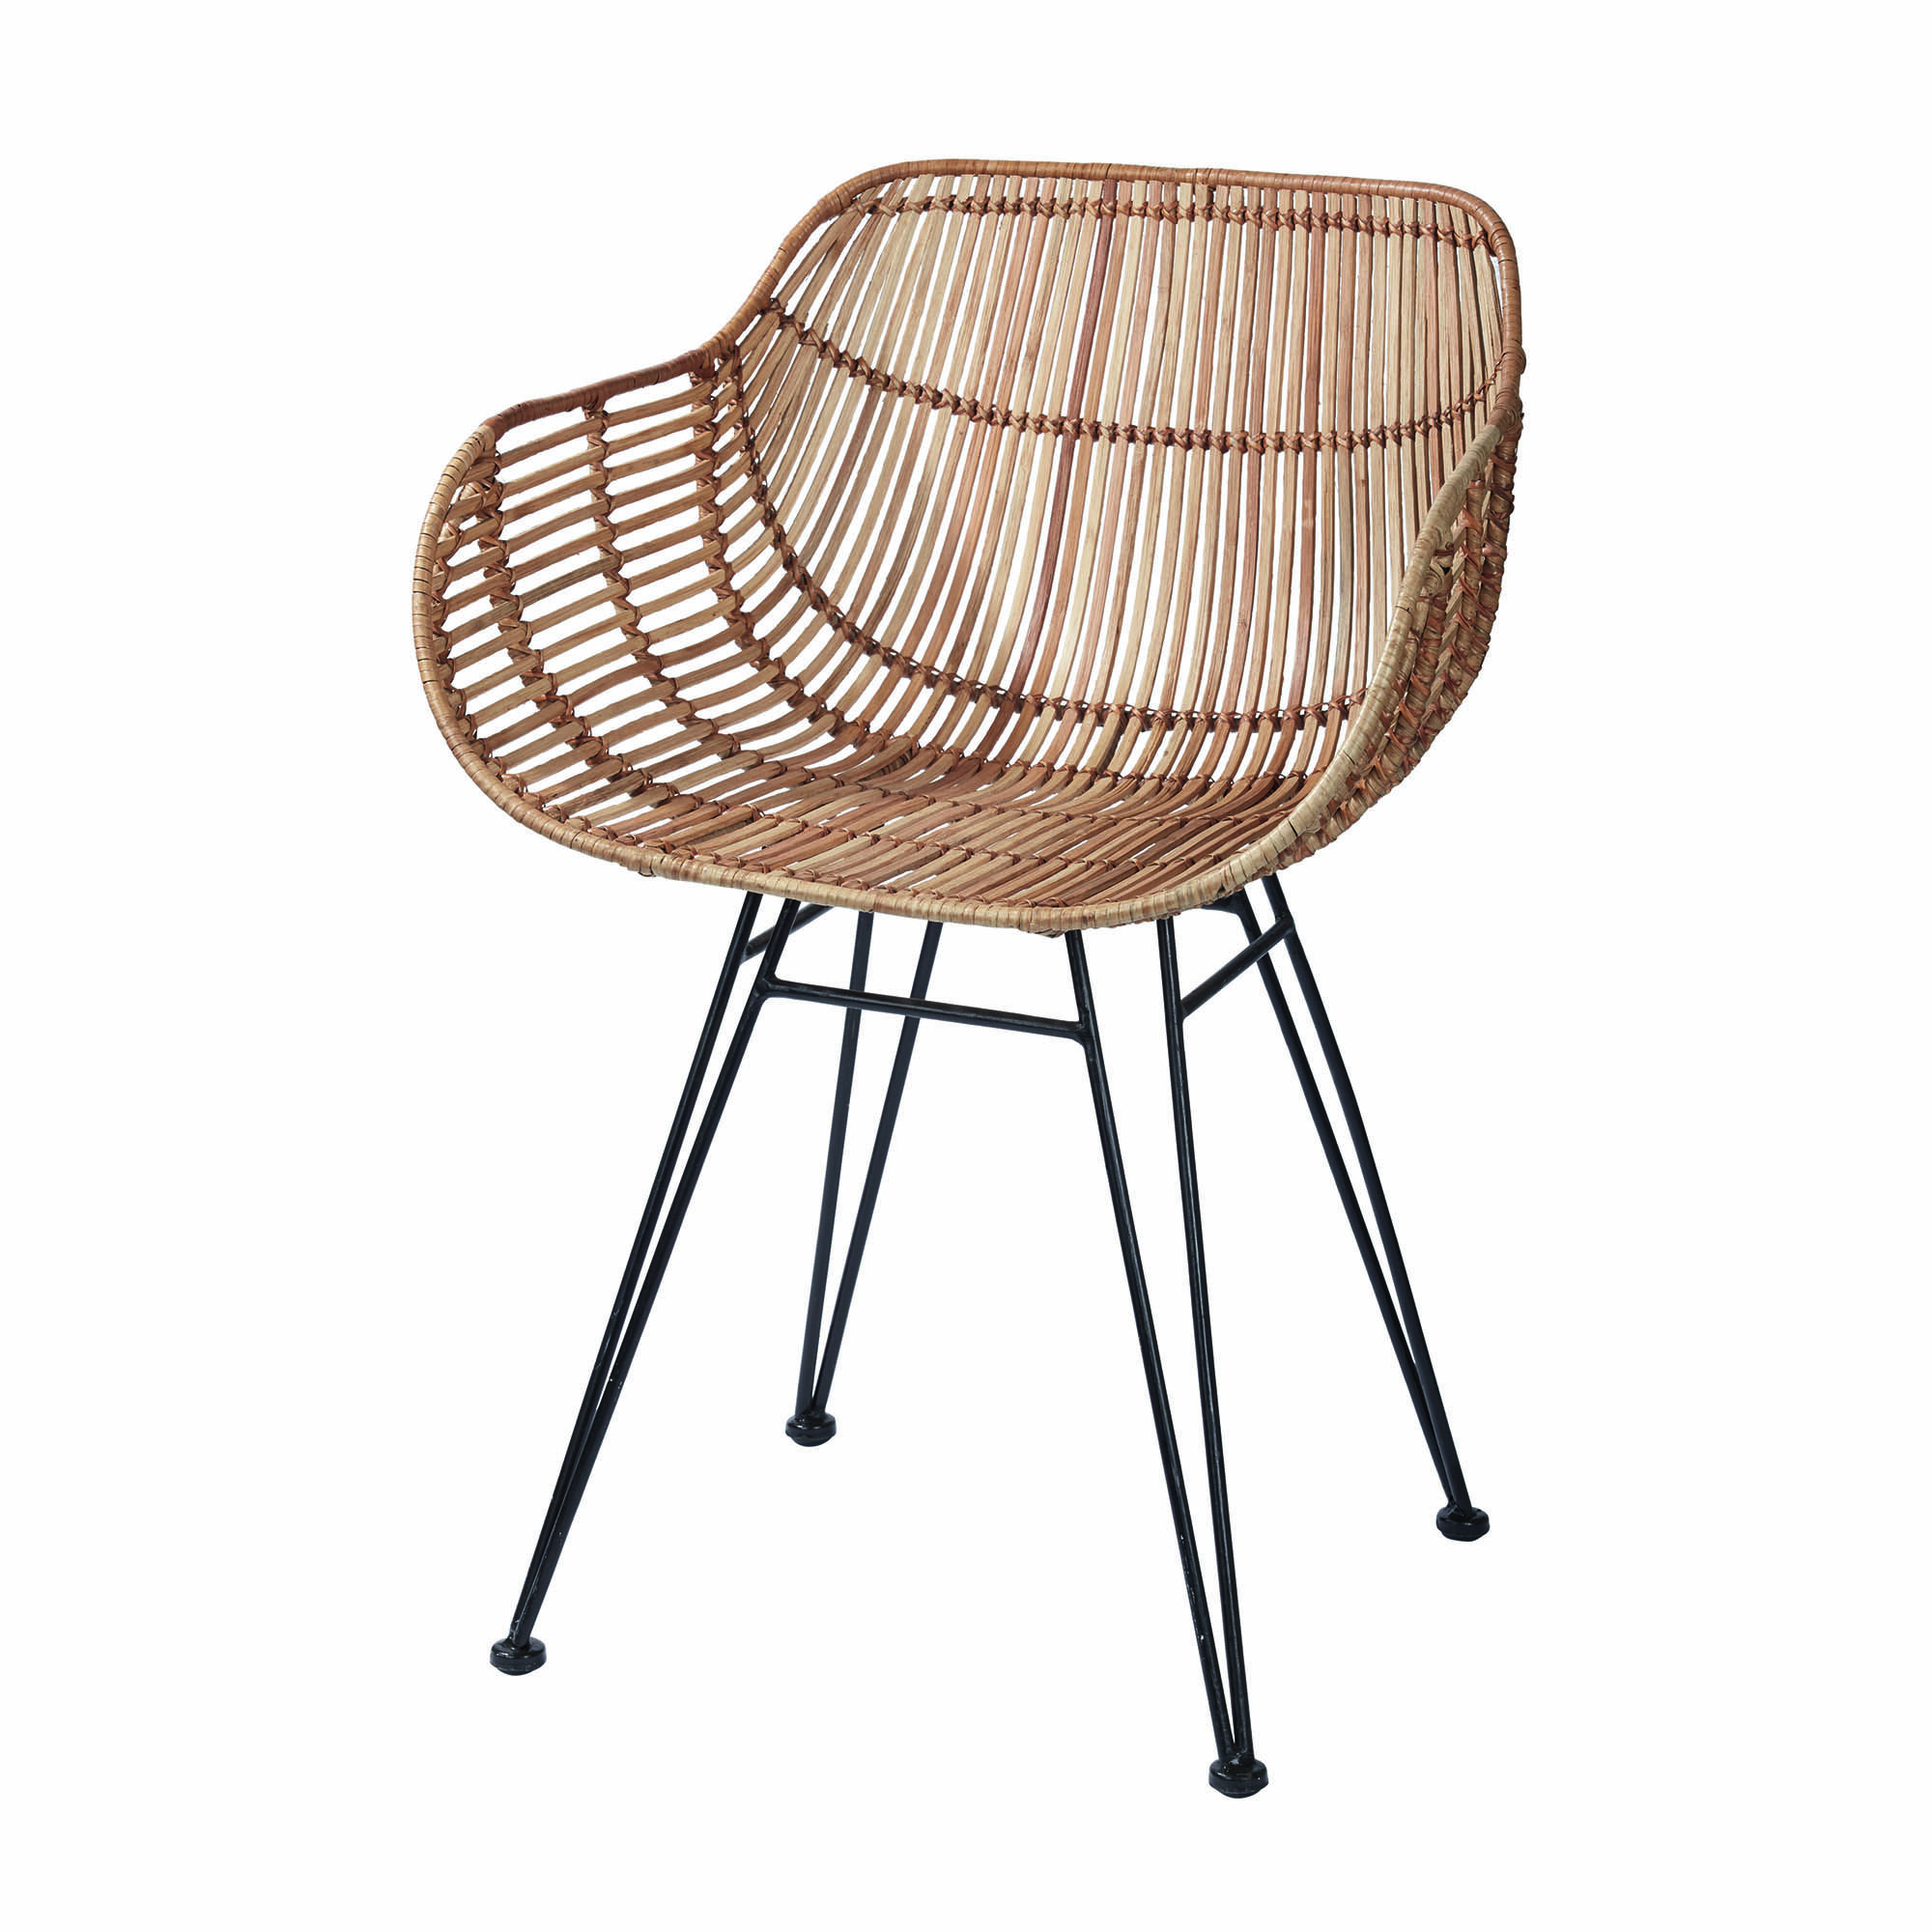 Bekasi Rattan Chair D Obj D Model ScanNihonPinoy Pinterest - Fauteuil rotin metal